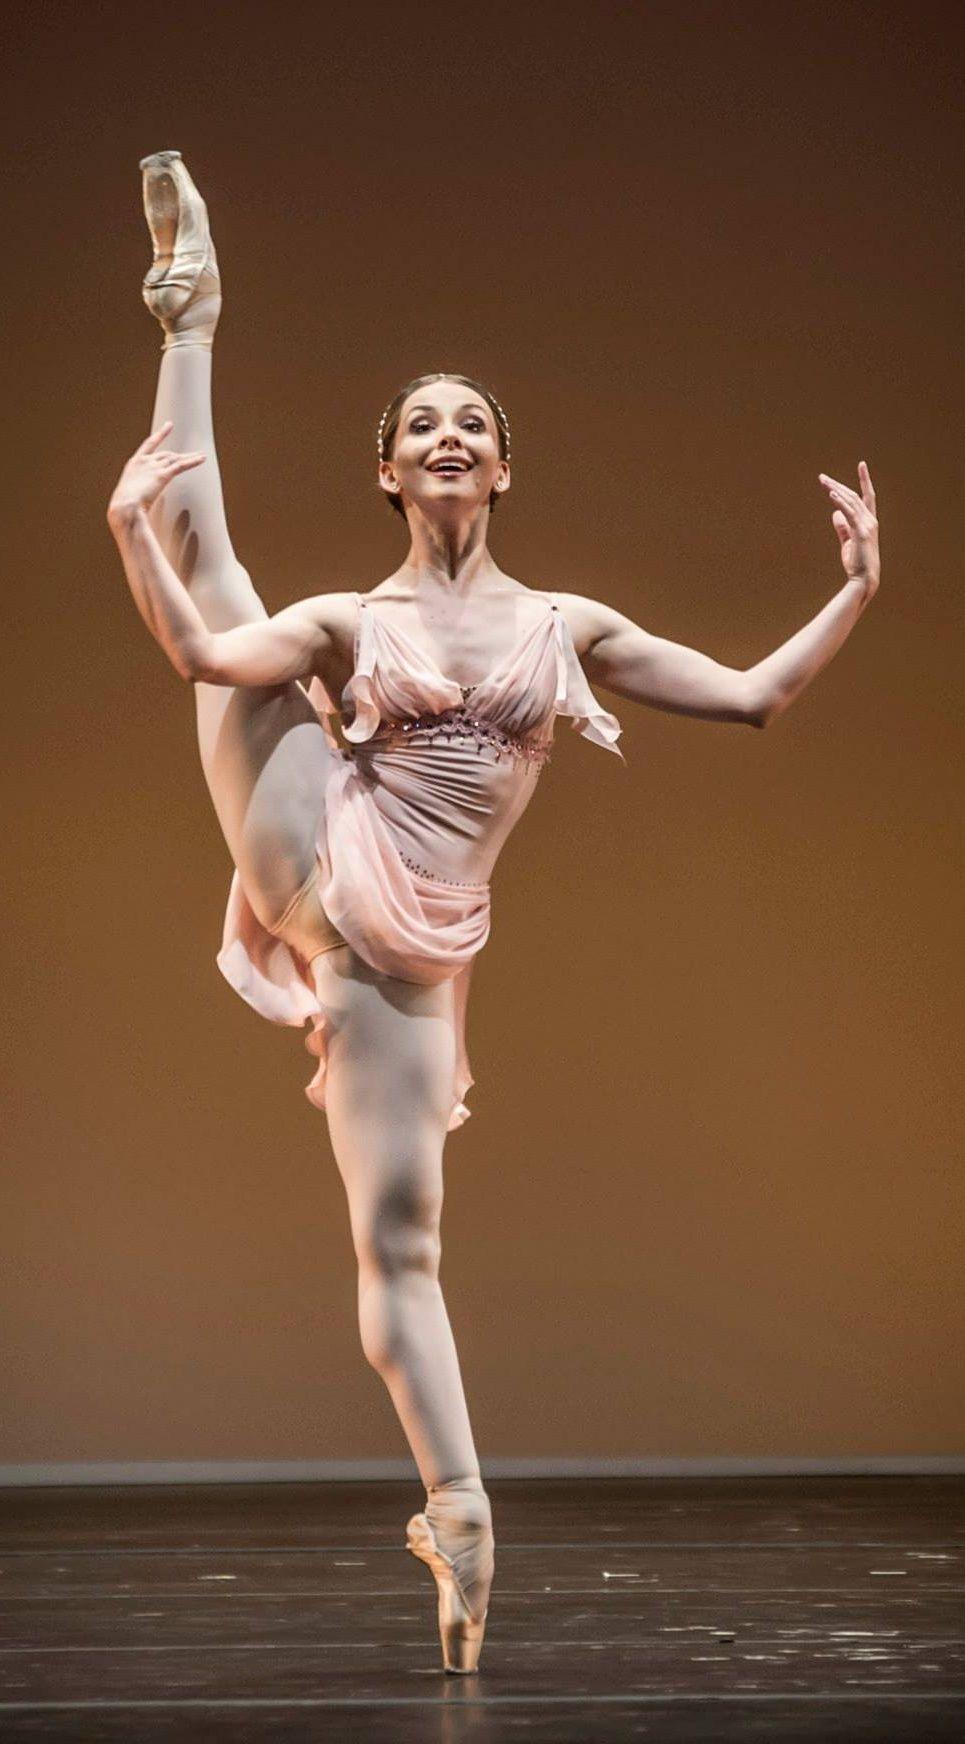 Ballerina Yevgenia Obraztsova: career, repertoire, personal life 92